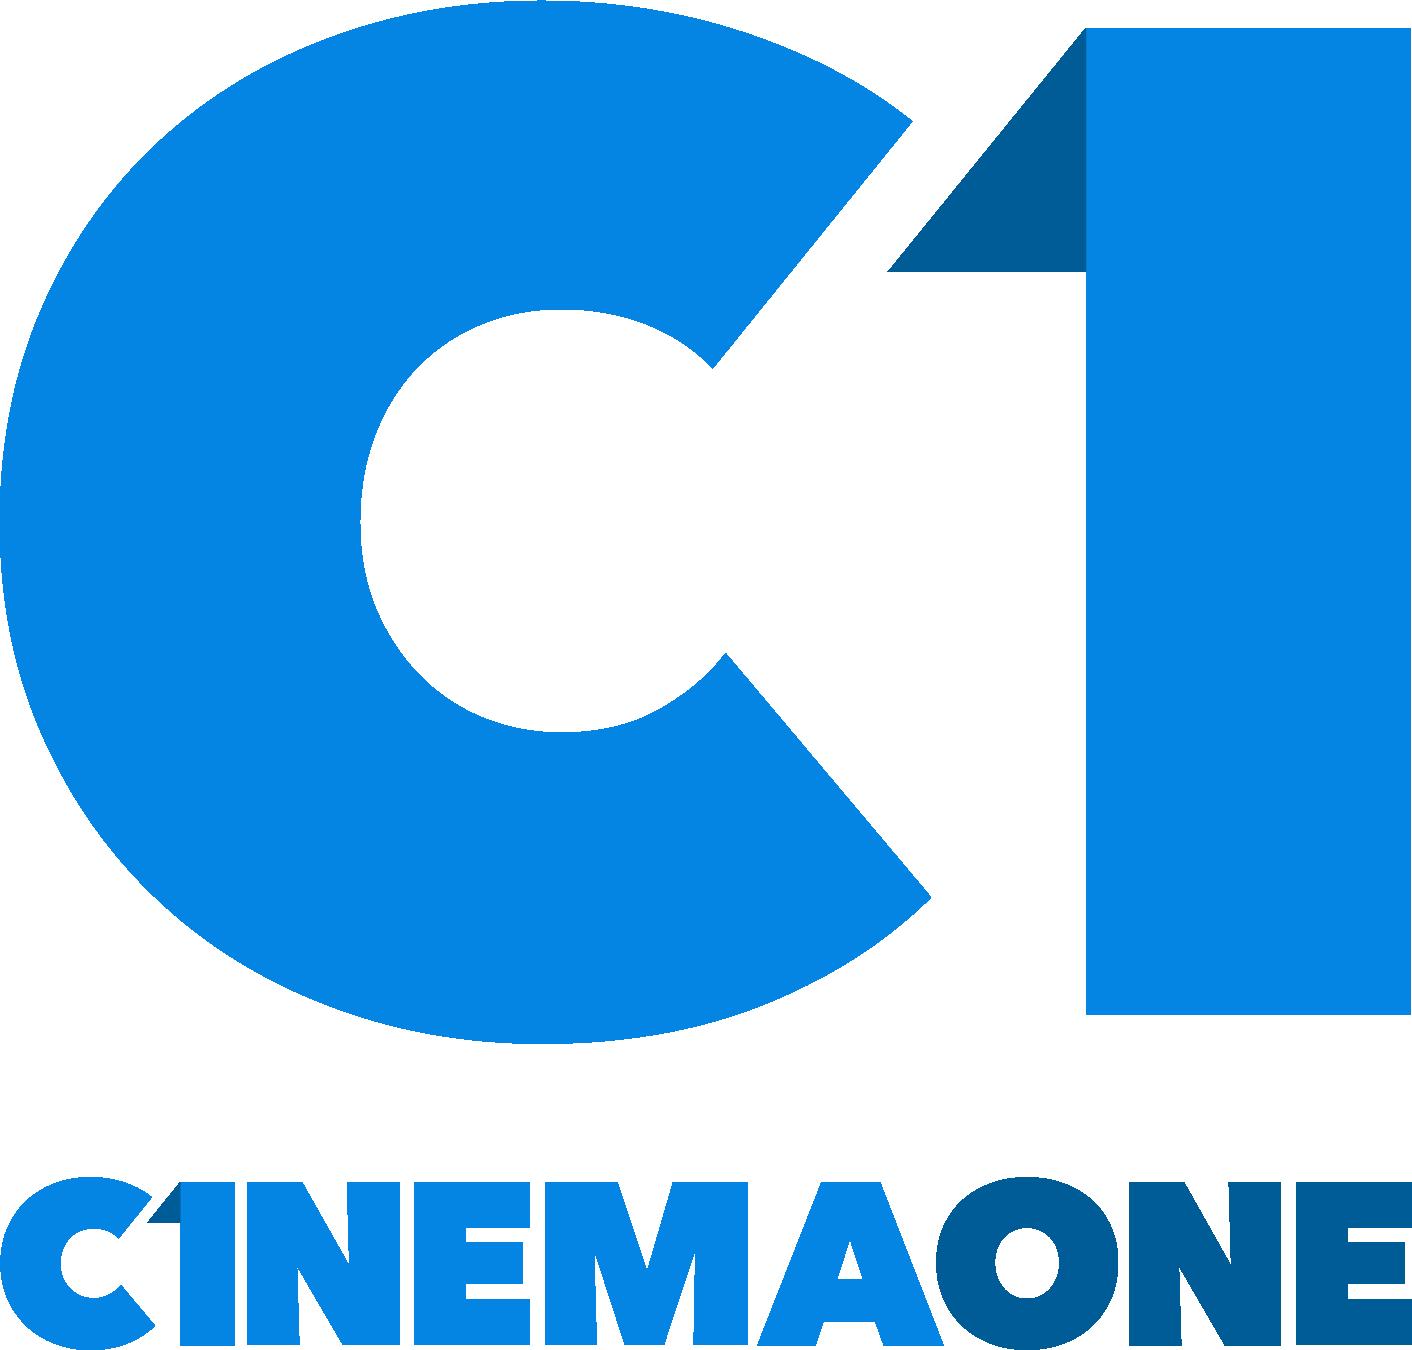 Category:Cinema One | ... Cinema One Logo